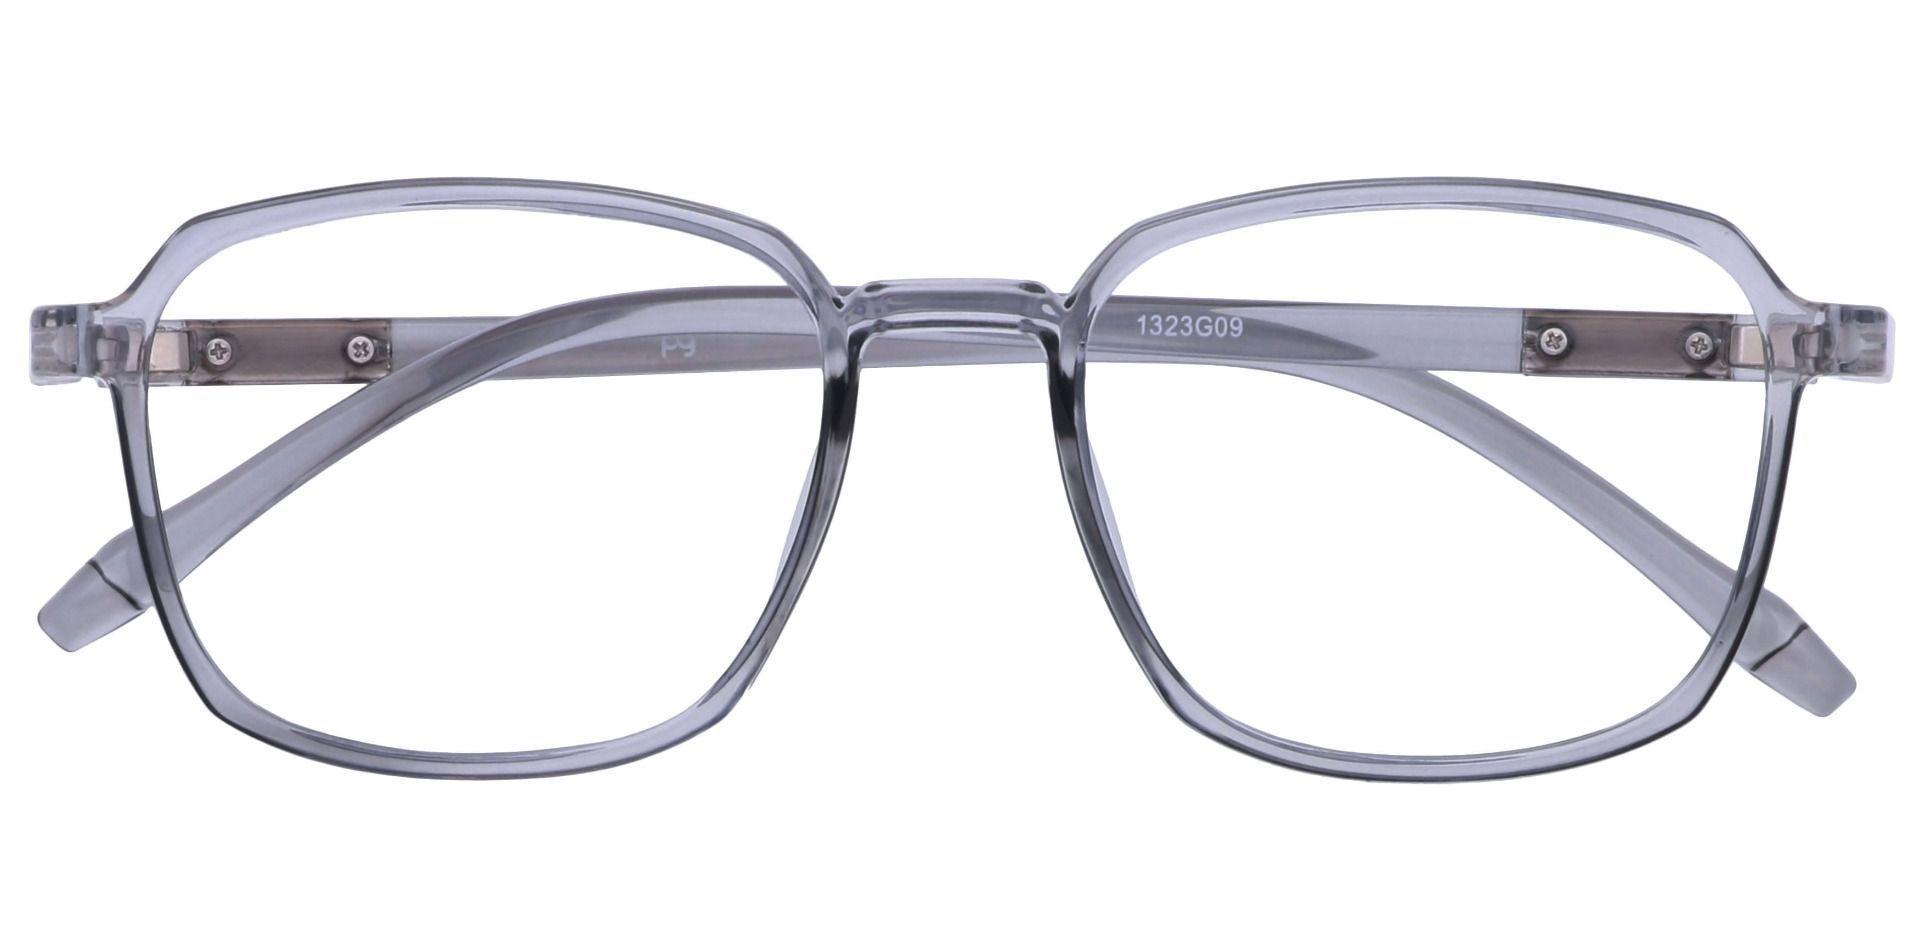 Stella Square Blue Light Blocking Glasses - Gray